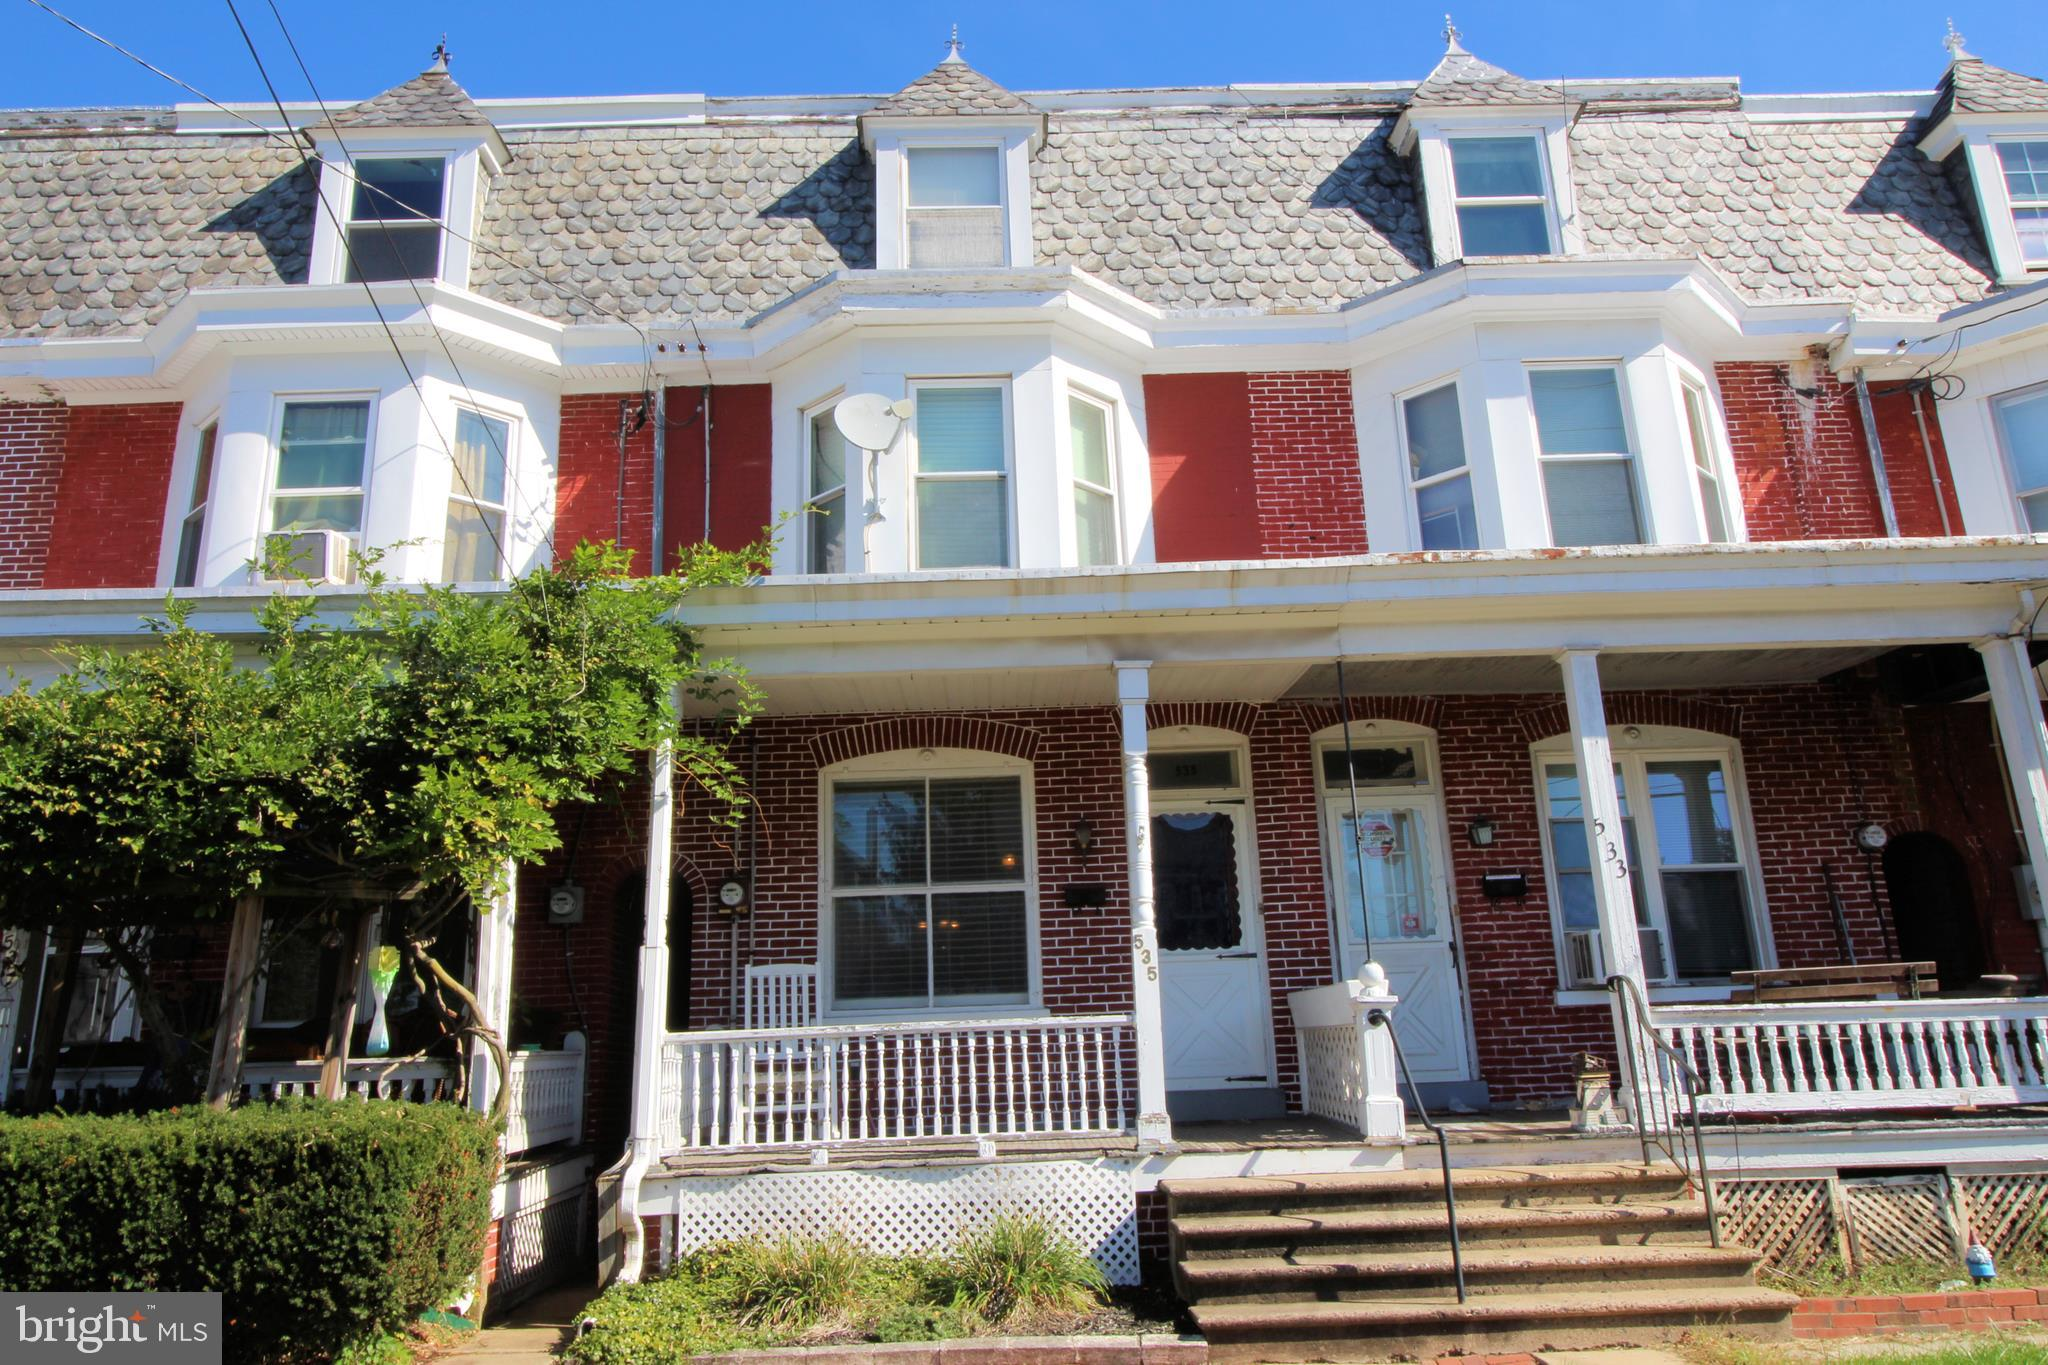 535 MAIN STREET, EAST GREENVILLE, PA 18041